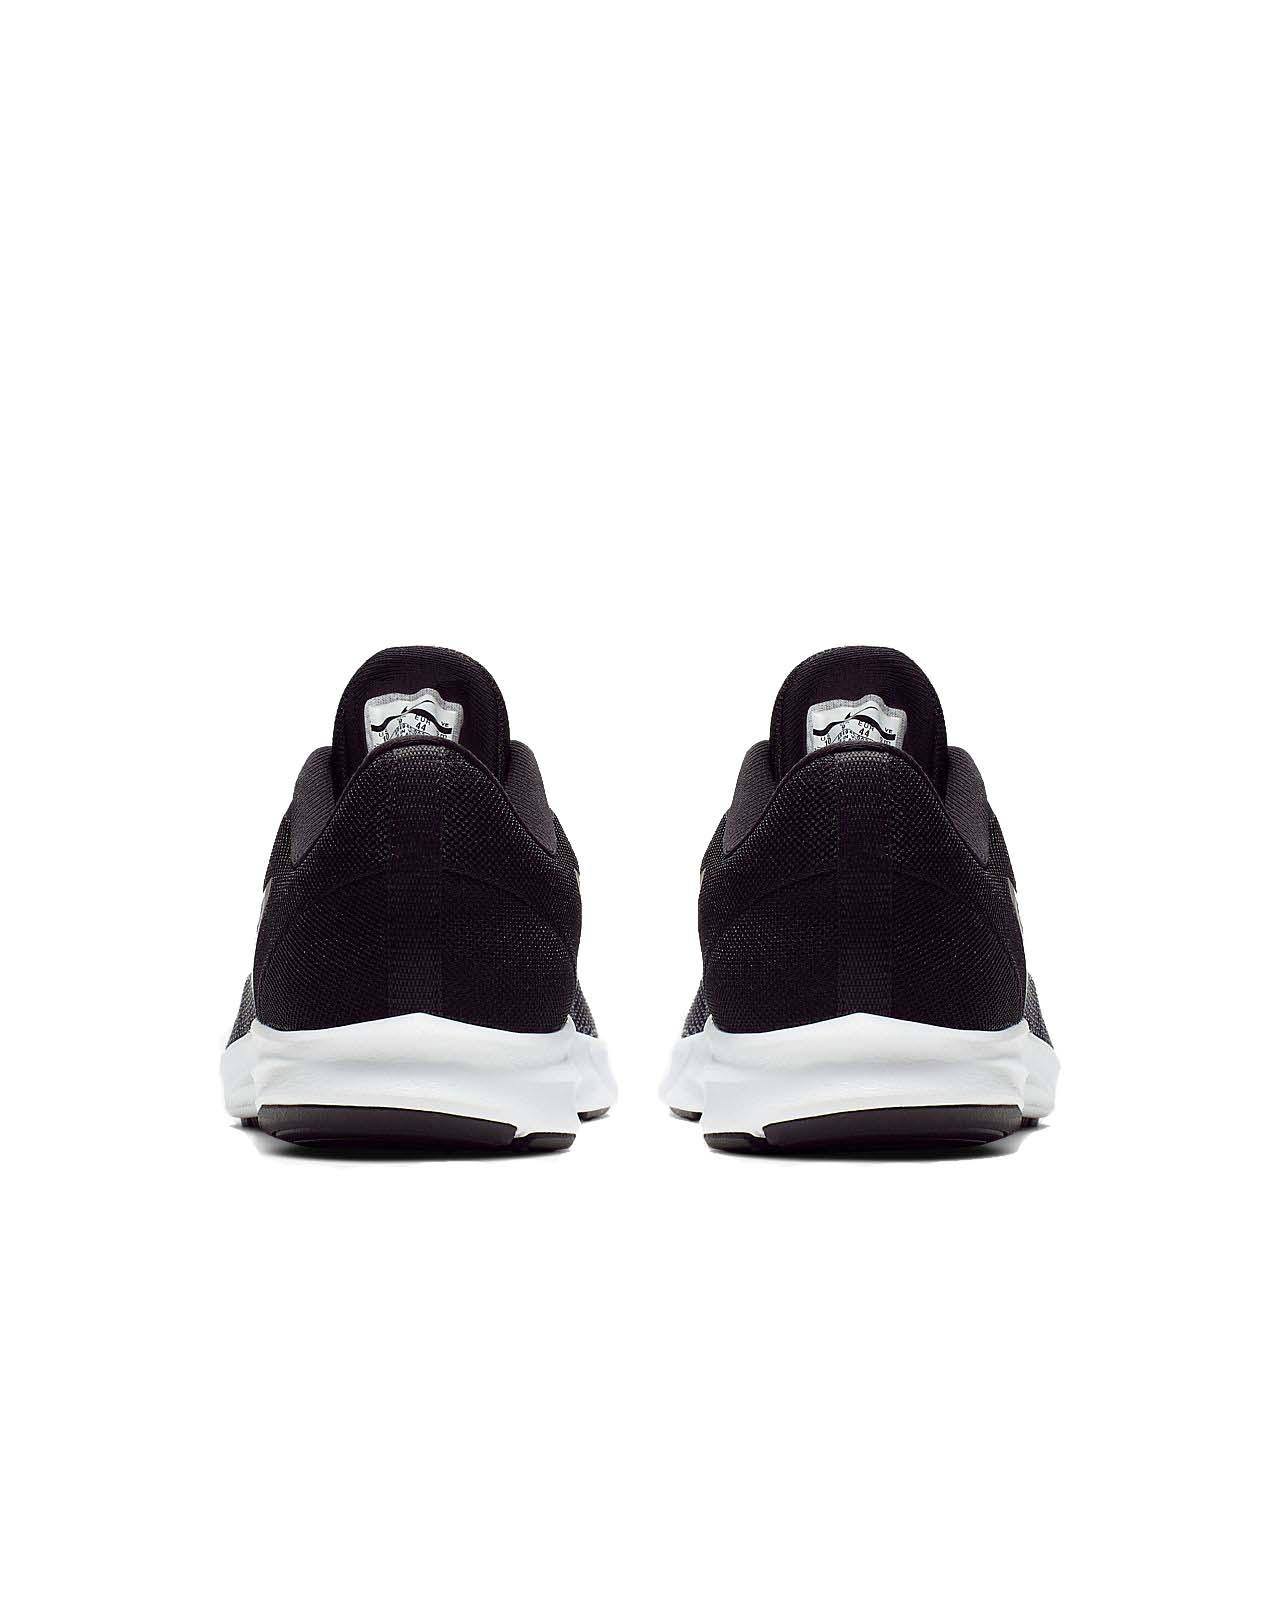 Nike-Men-039-s-Downshifter-9-Wide-Running-Shoes thumbnail 5